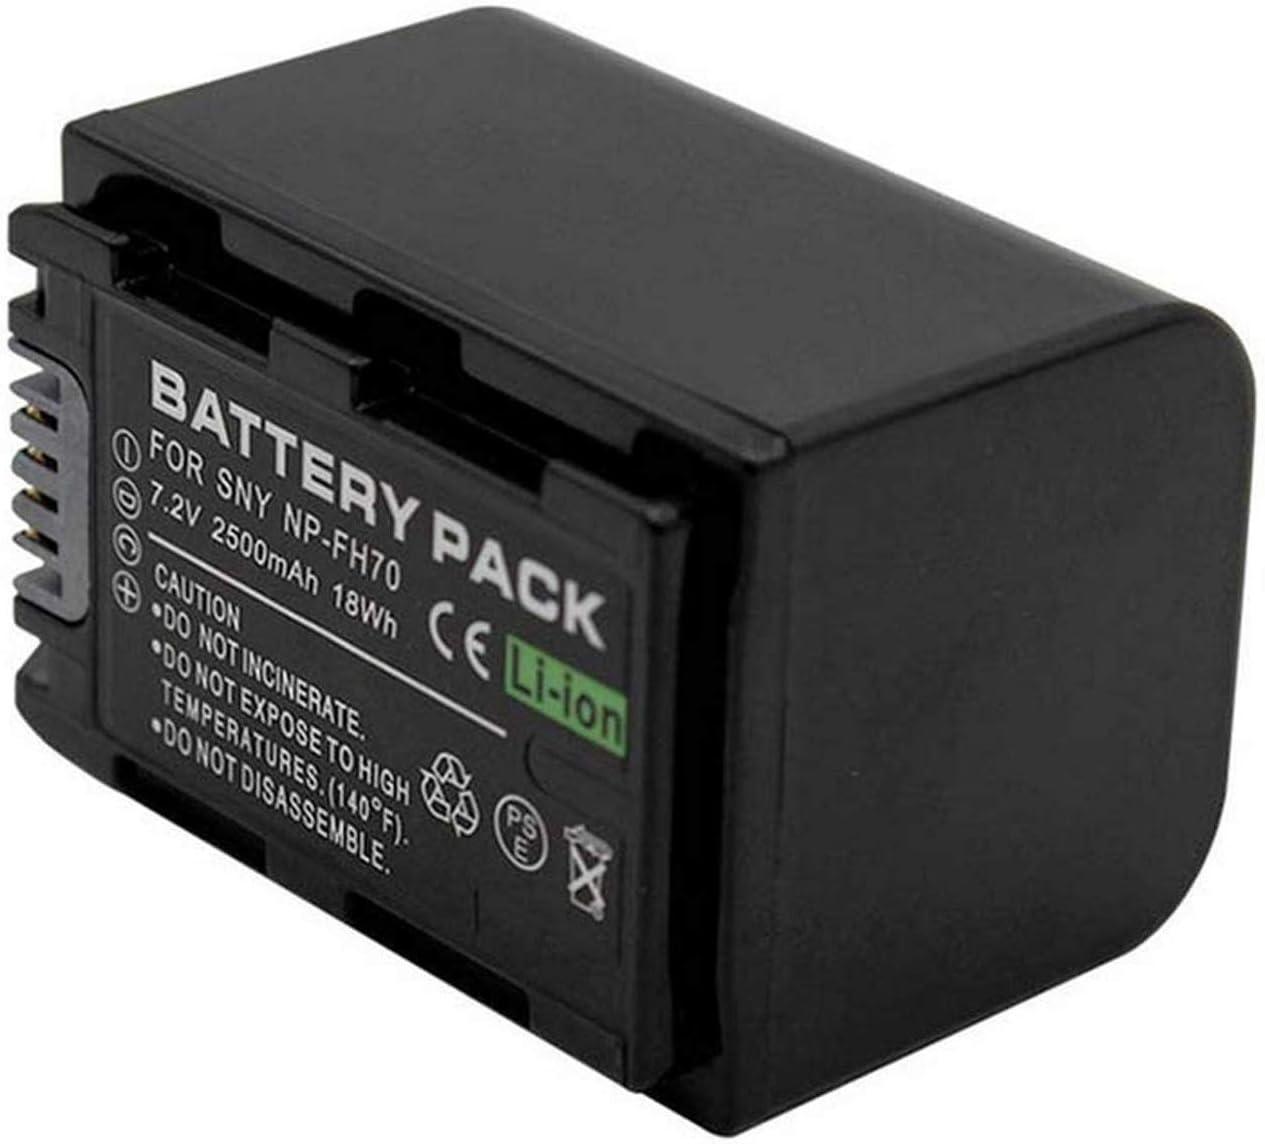 DCR-SX60 Handycam Camcorder Battery Pack for Sony DCR-SX30 DCR-SX40 DCR-SX50